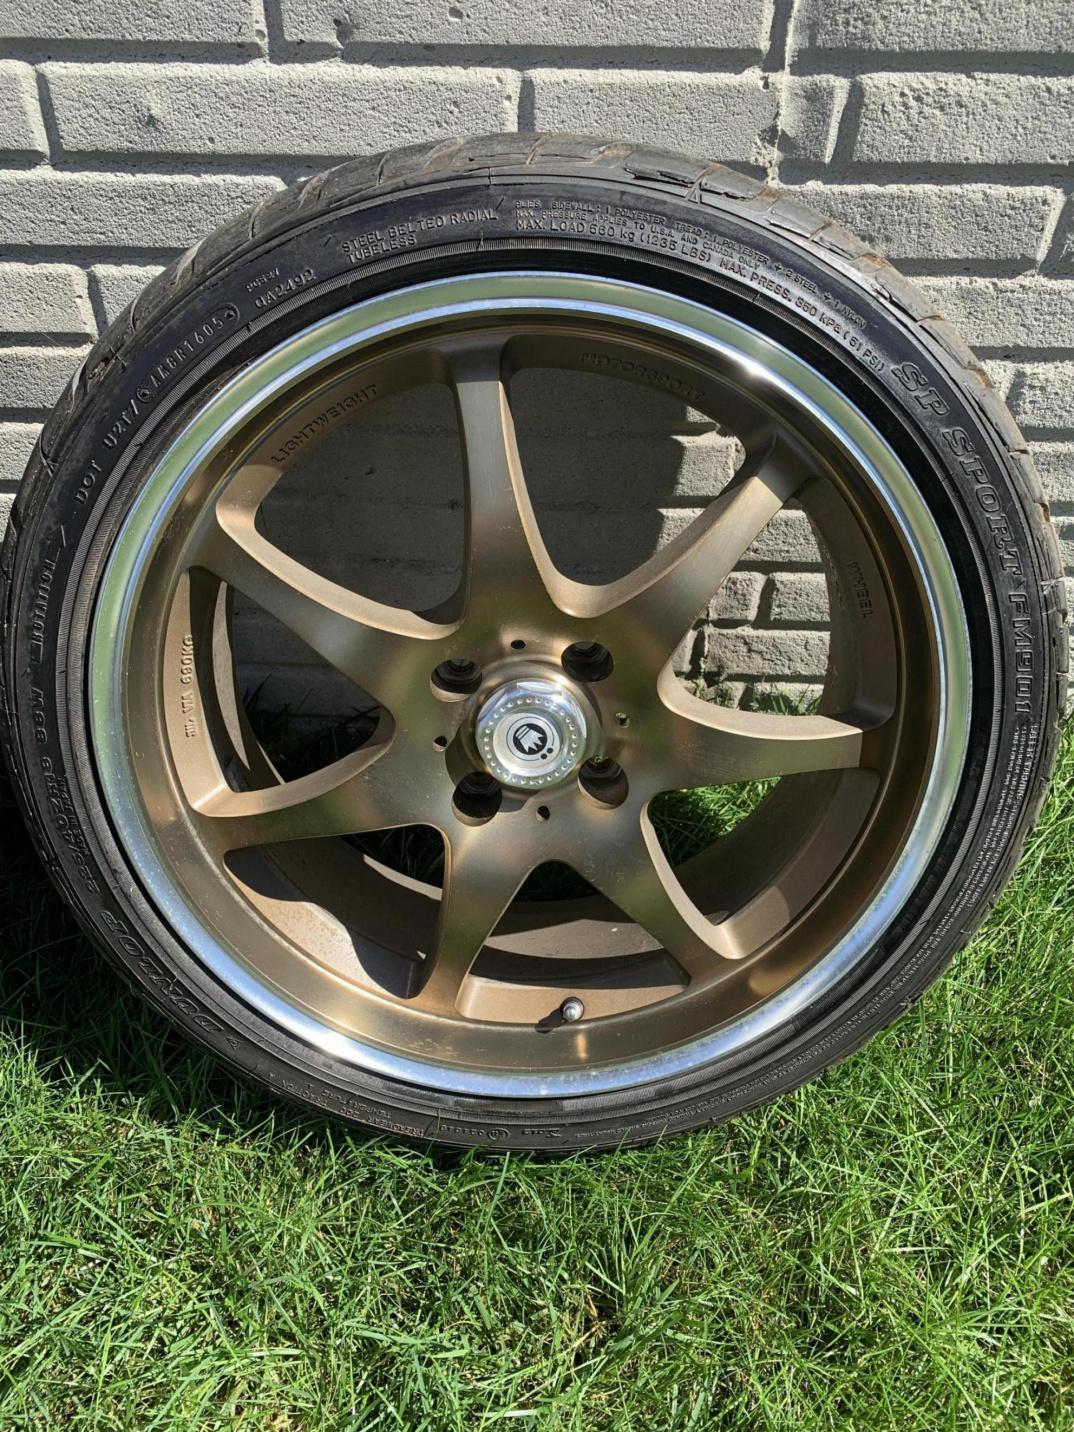 18 inch konig next copper wheels-8e998bd1-81c1-4c37-8813-a54e8776f86b_1560283753735.jpg